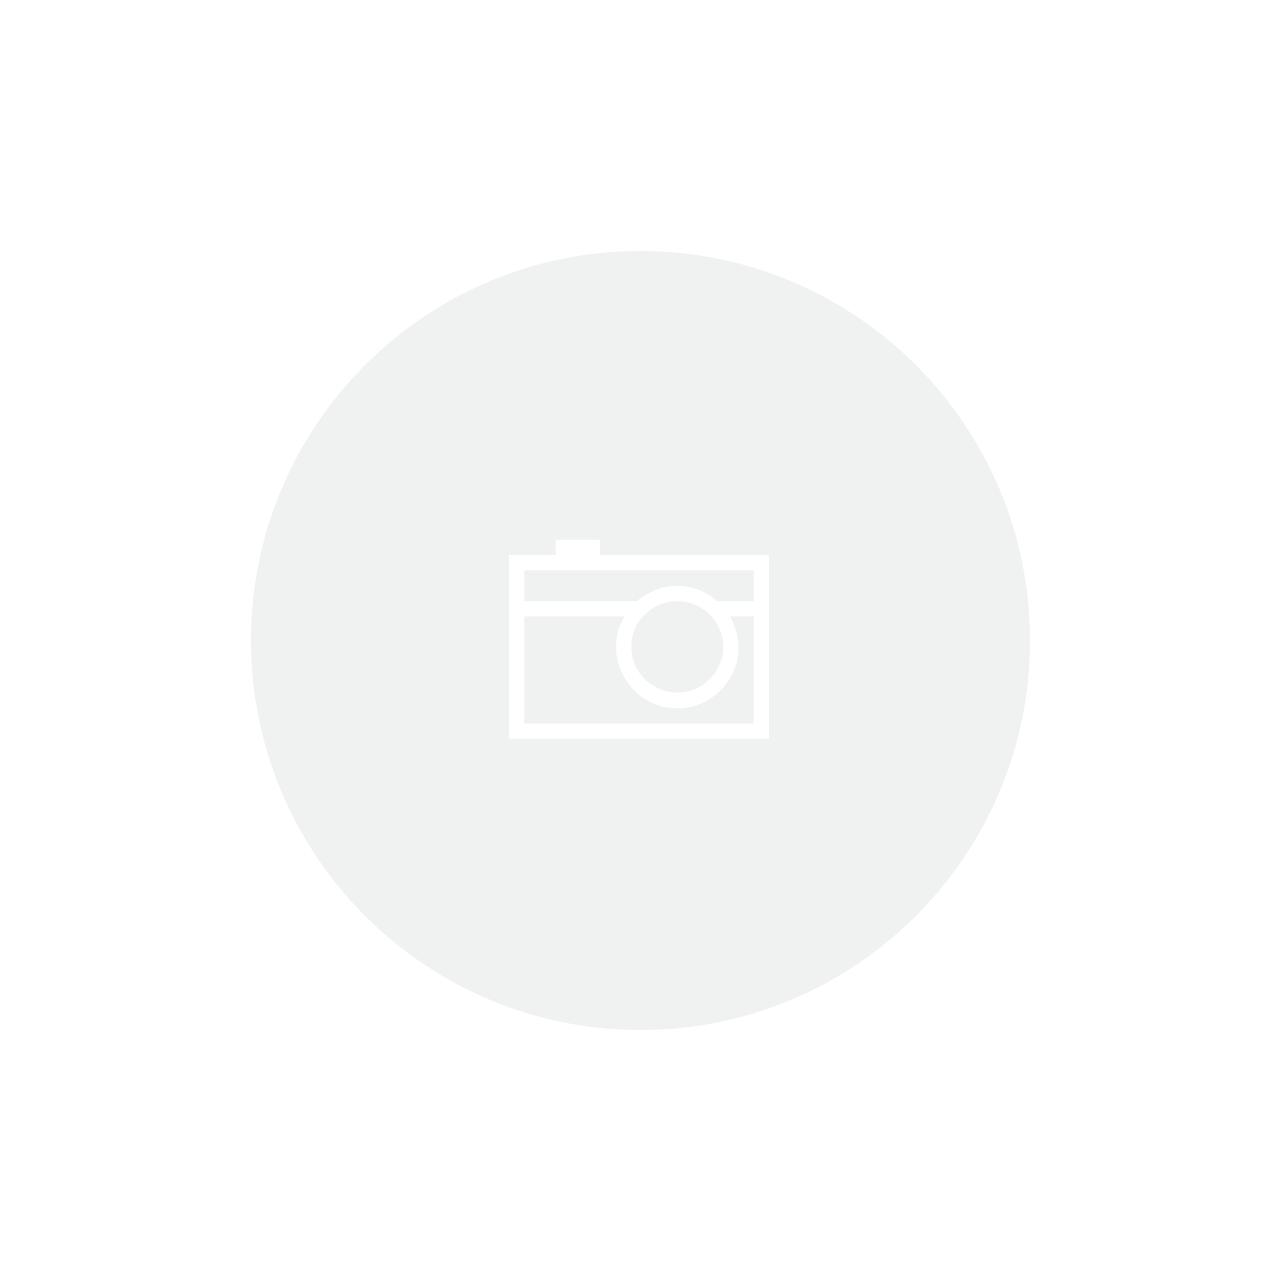 Papel Artesanal Indiano - Ref. 58